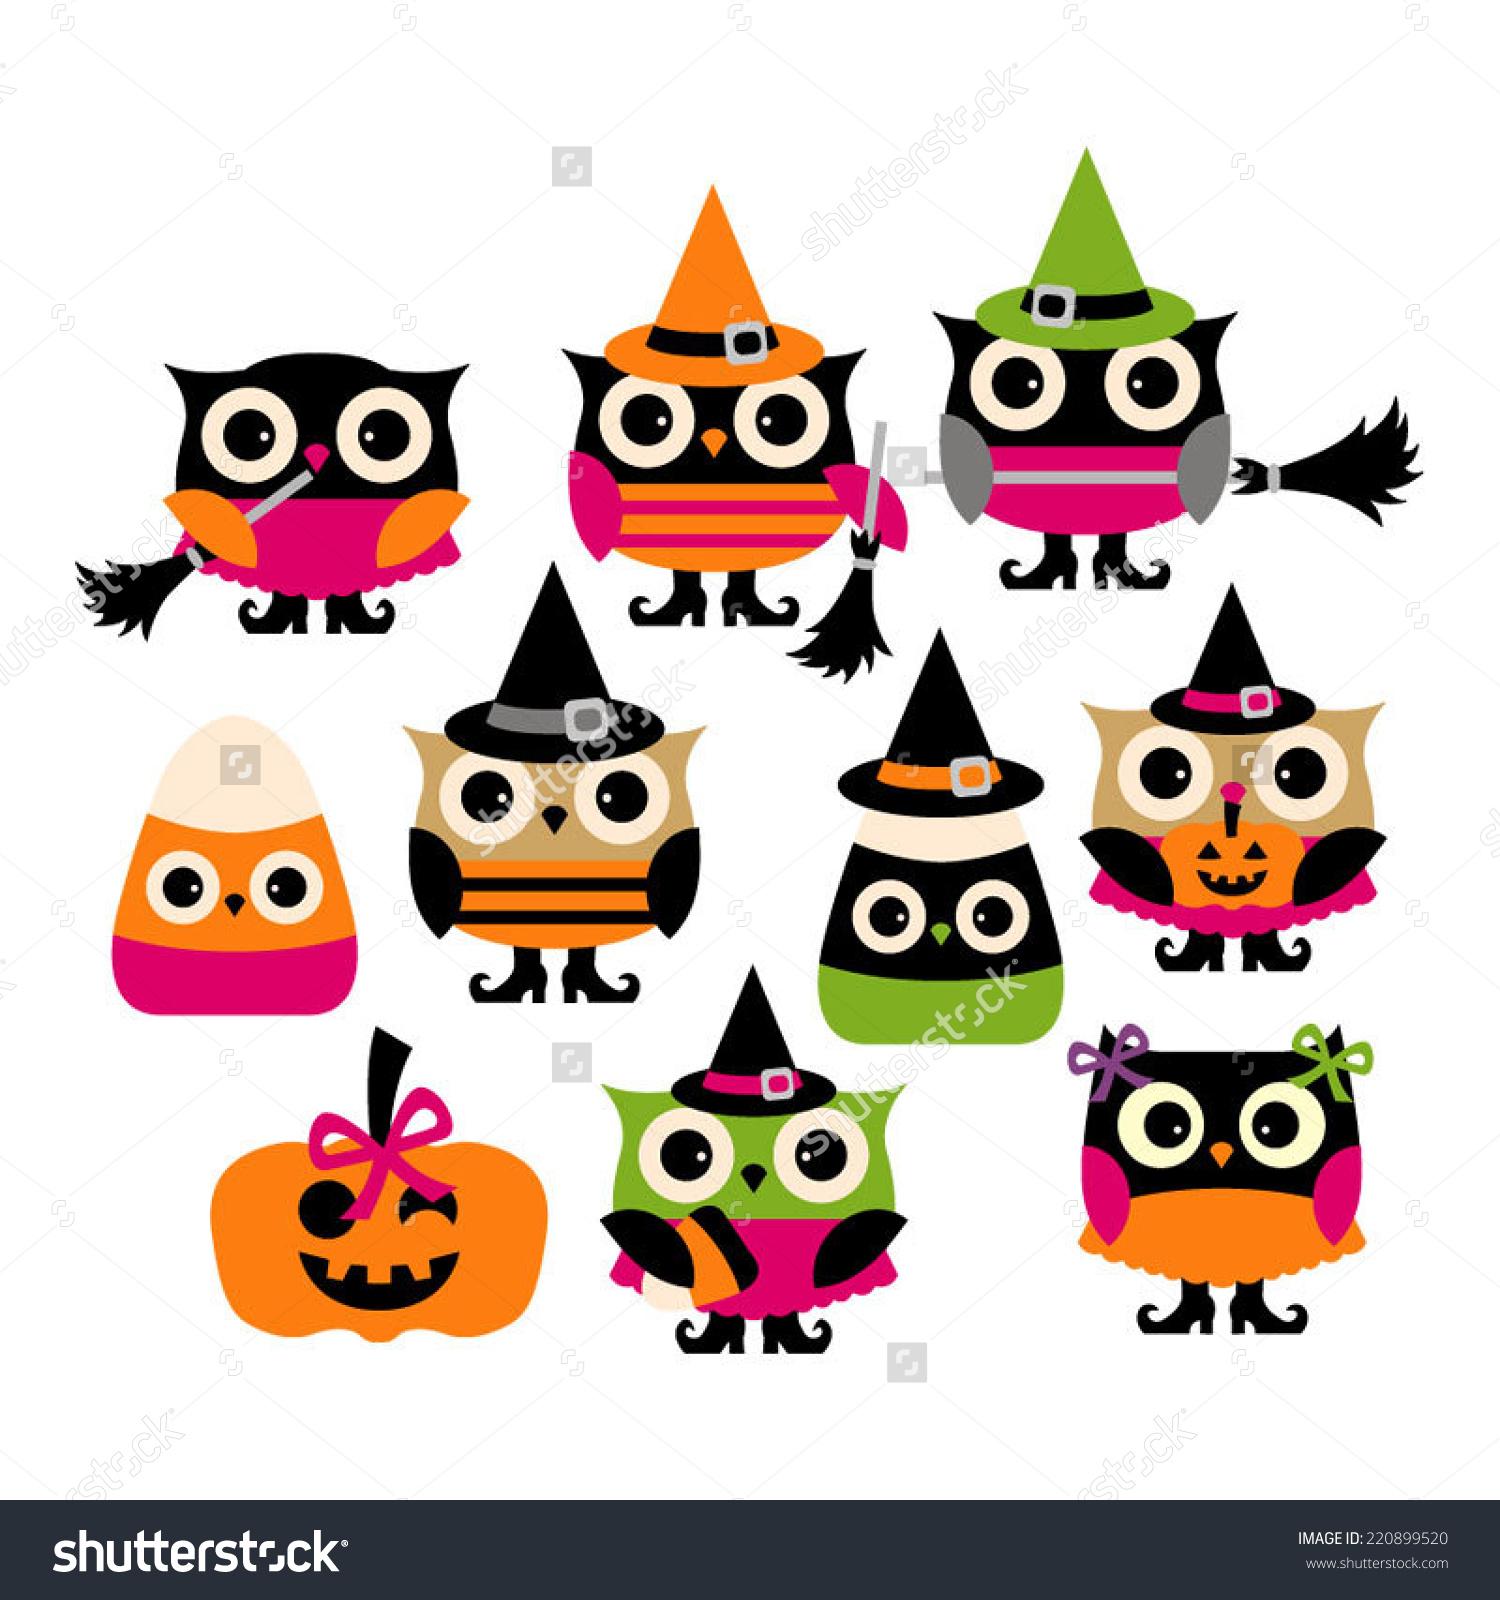 Cute Halloween Owl Vector Clip .-Cute Halloween Owl Vector Clip .-3